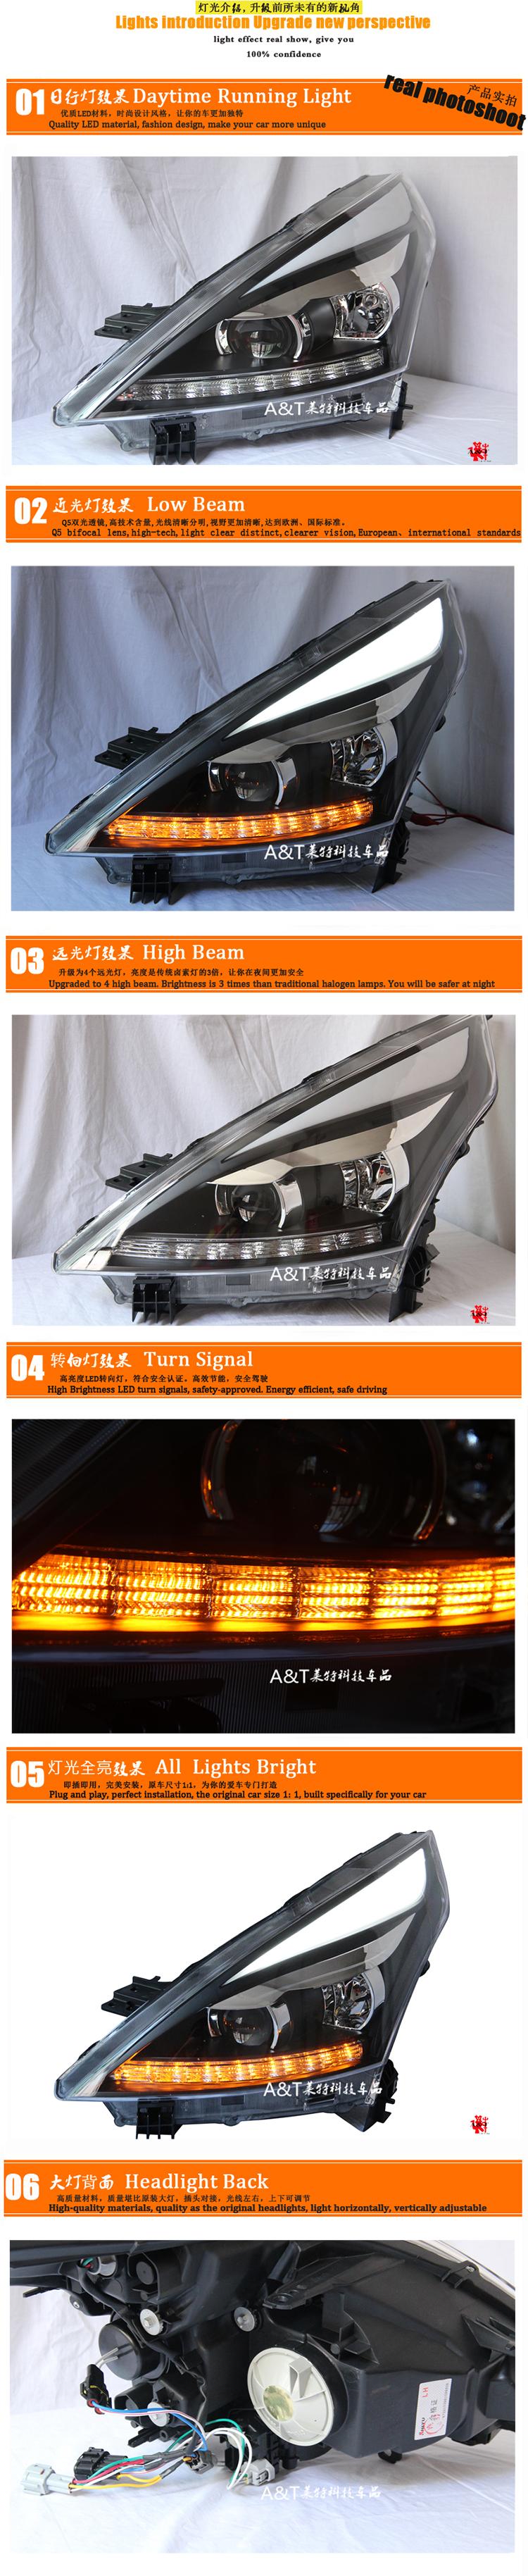 Auto Clud Car Styling for Nissan Teana LED Headlight 2012 Altima Headlight DRL Lens Double Beam H7 HID Xenon bi xenon lens